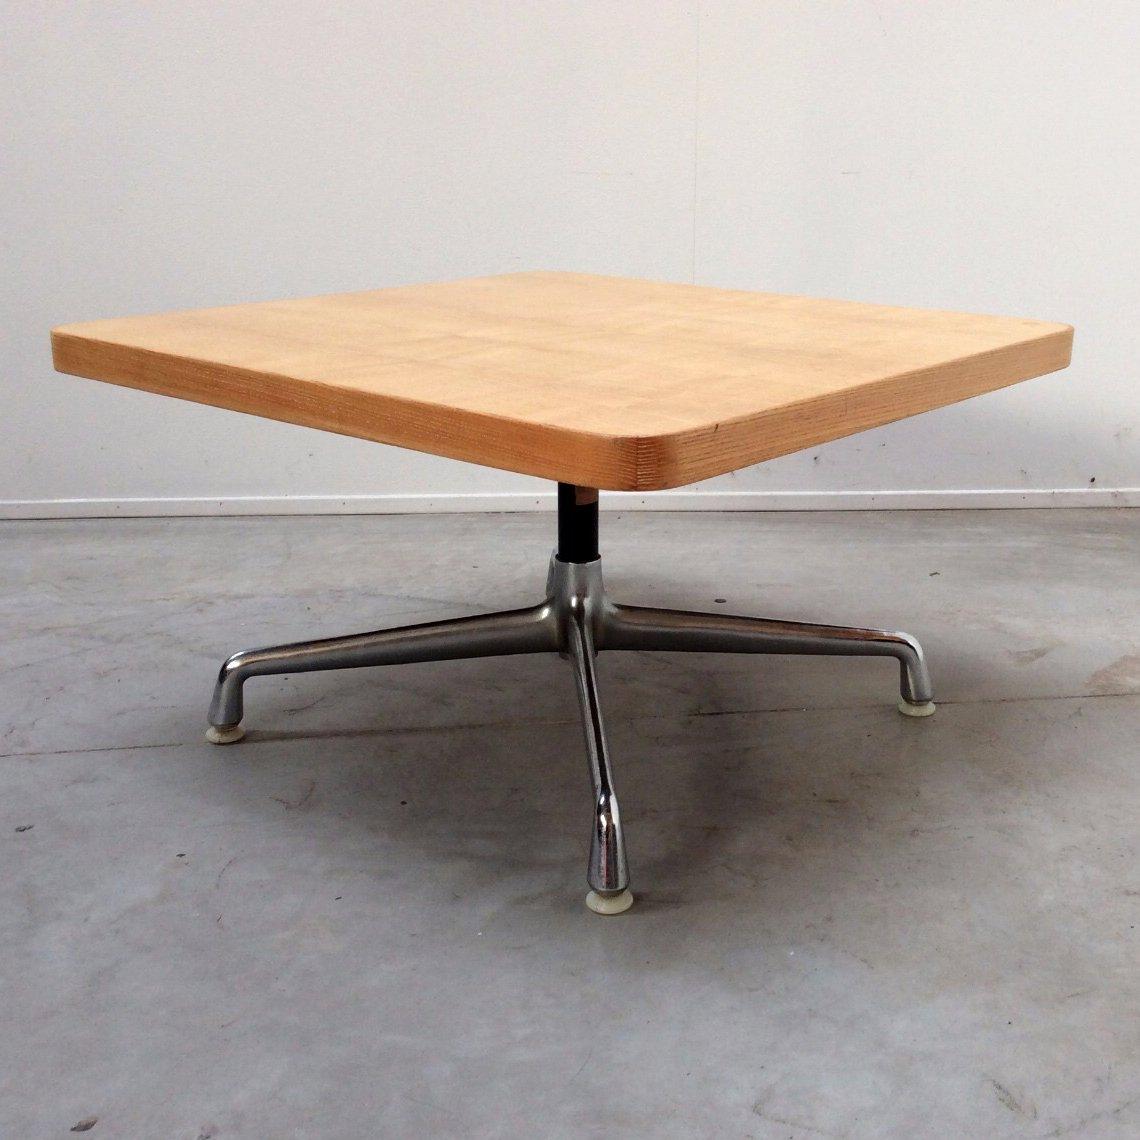 table basse vintage par charles eames pour herman miller etats unis 1960s en vente sur pamono. Black Bedroom Furniture Sets. Home Design Ideas